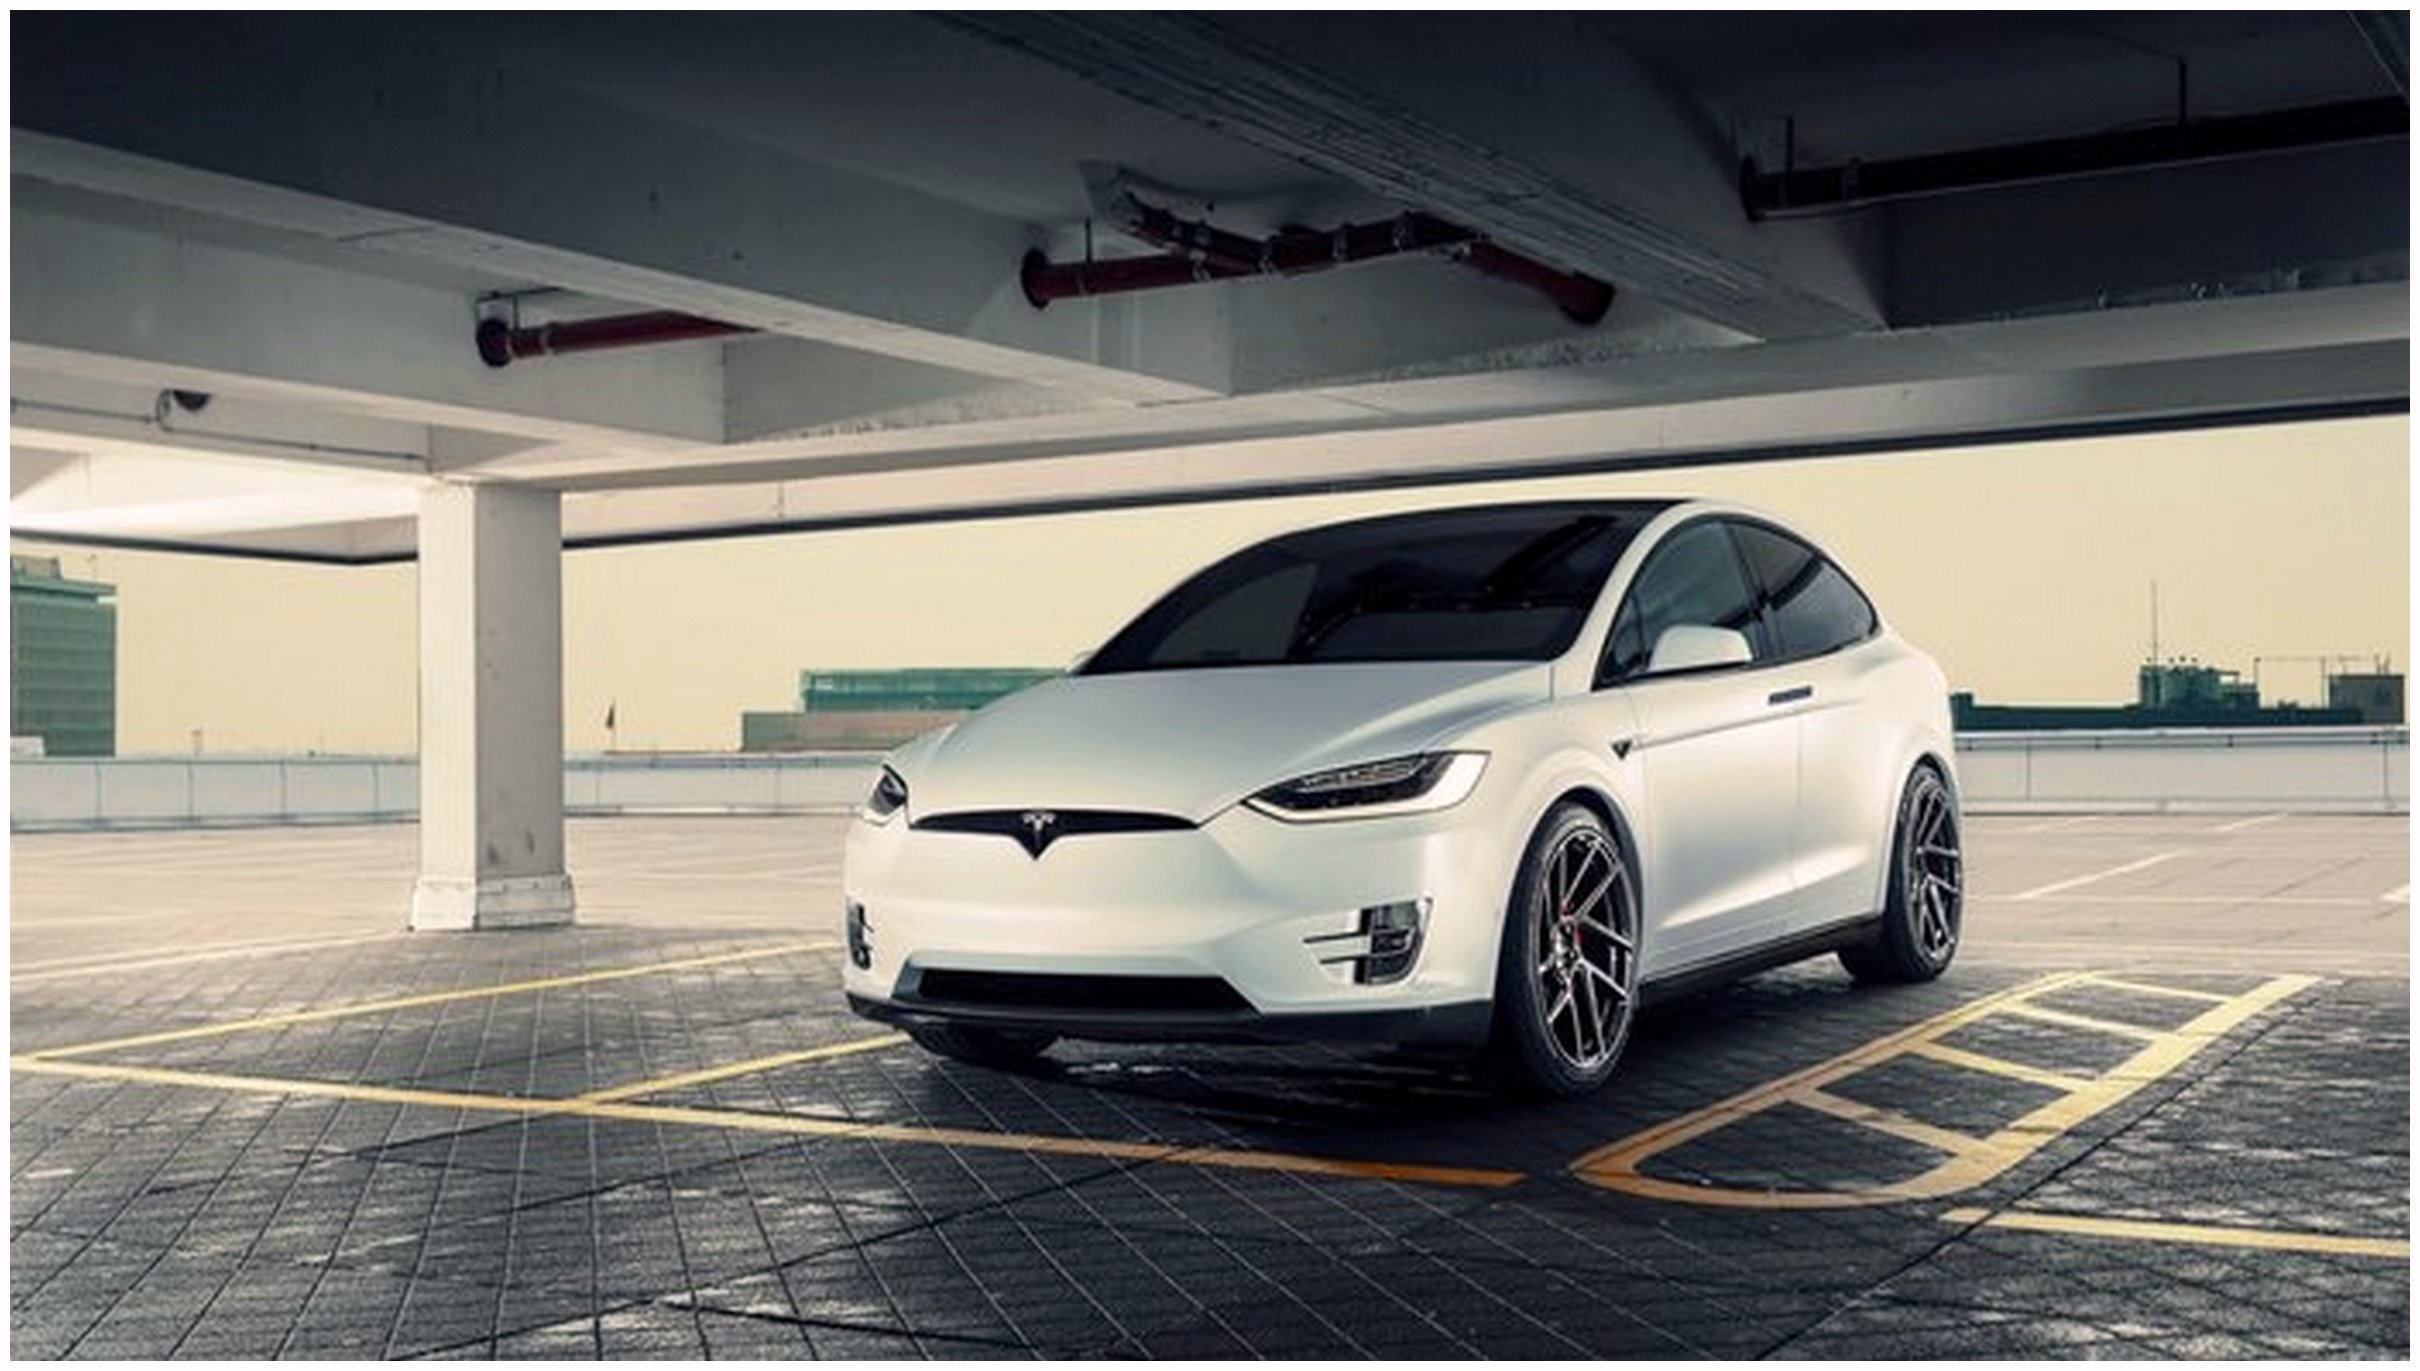 Download Tesla Model X HD Wallpapers free